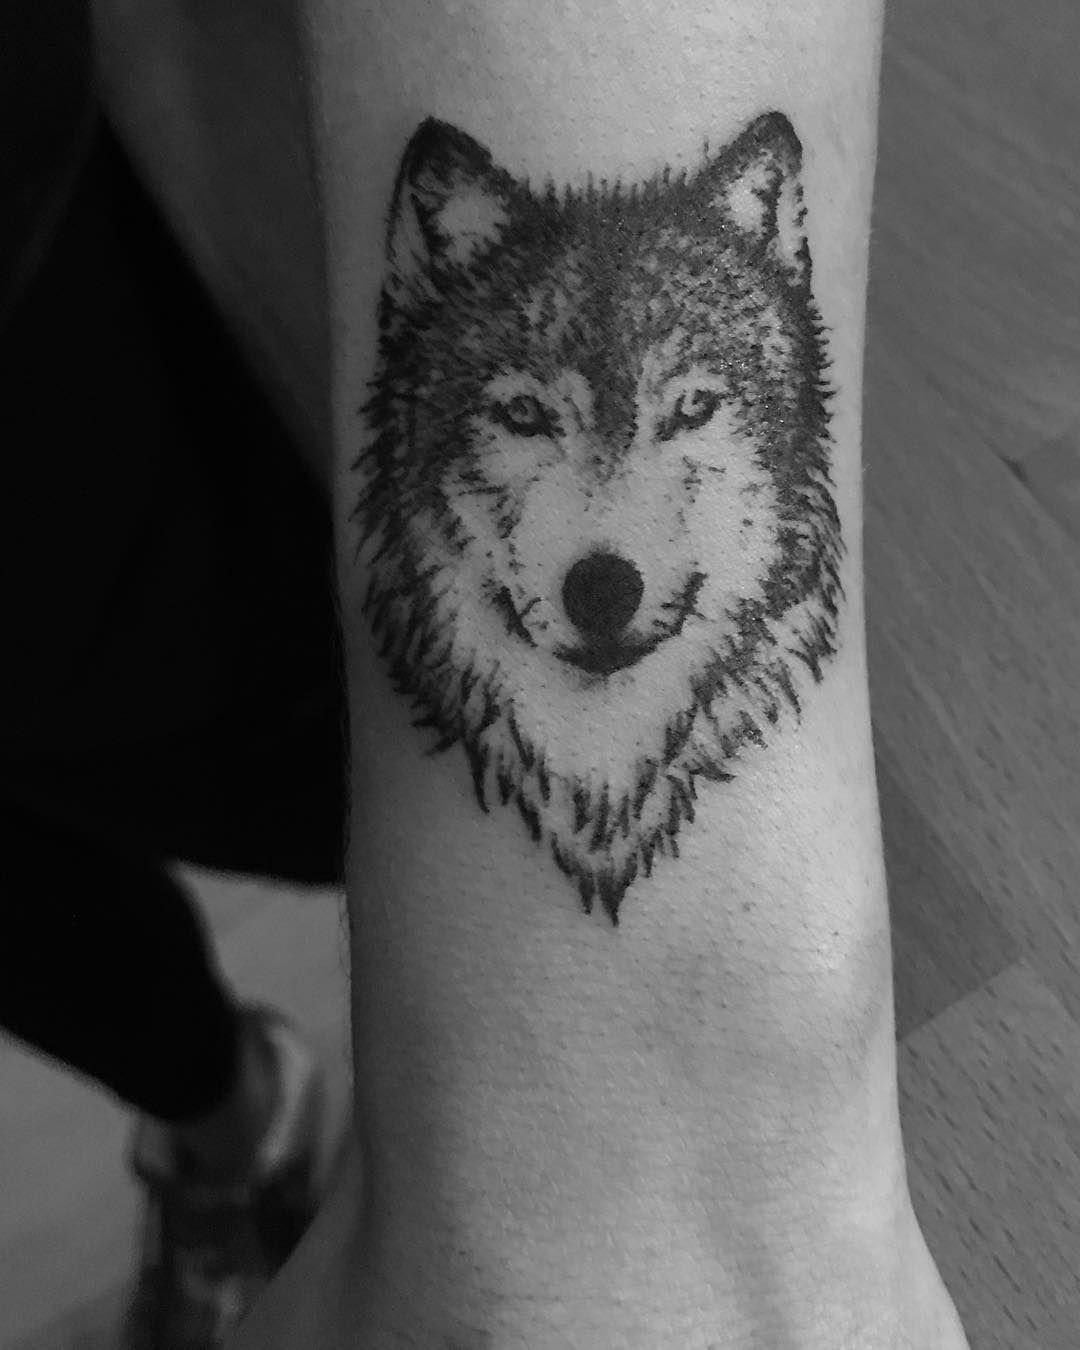 26+ Tete de loup tatouage trends